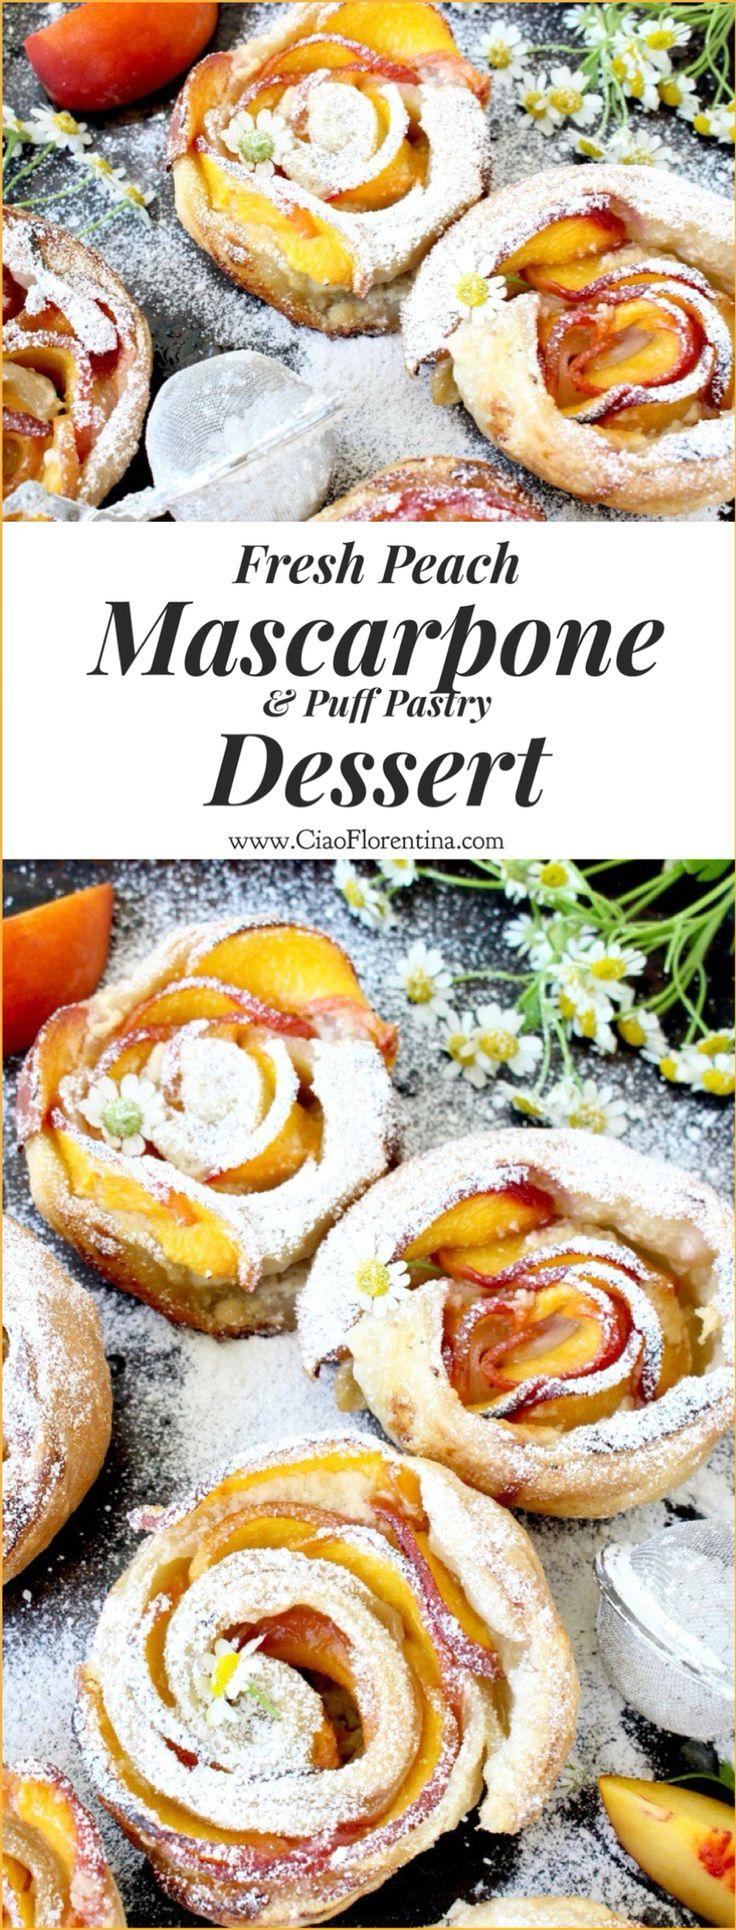 Fresh Peach Dessert Recipe with Mascarpone, Vanilla Bean and Flaky ...